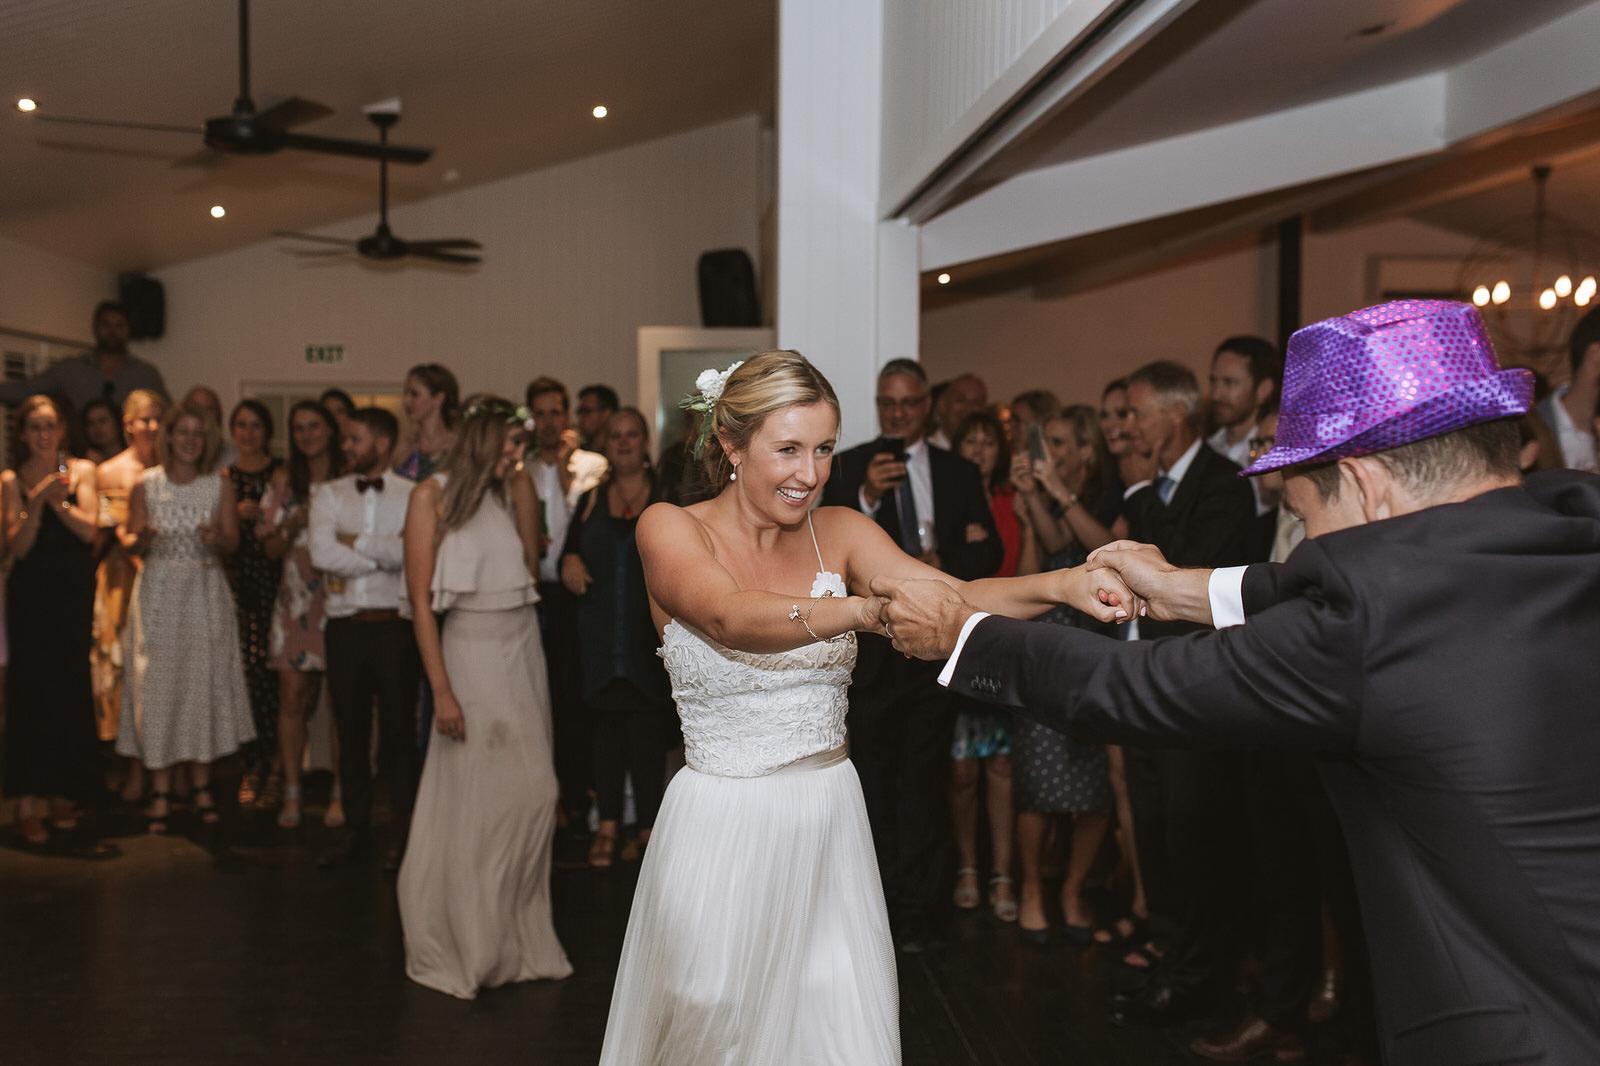 newfound-r-s-ataahua-garden-venue-tauranga-wedding-139